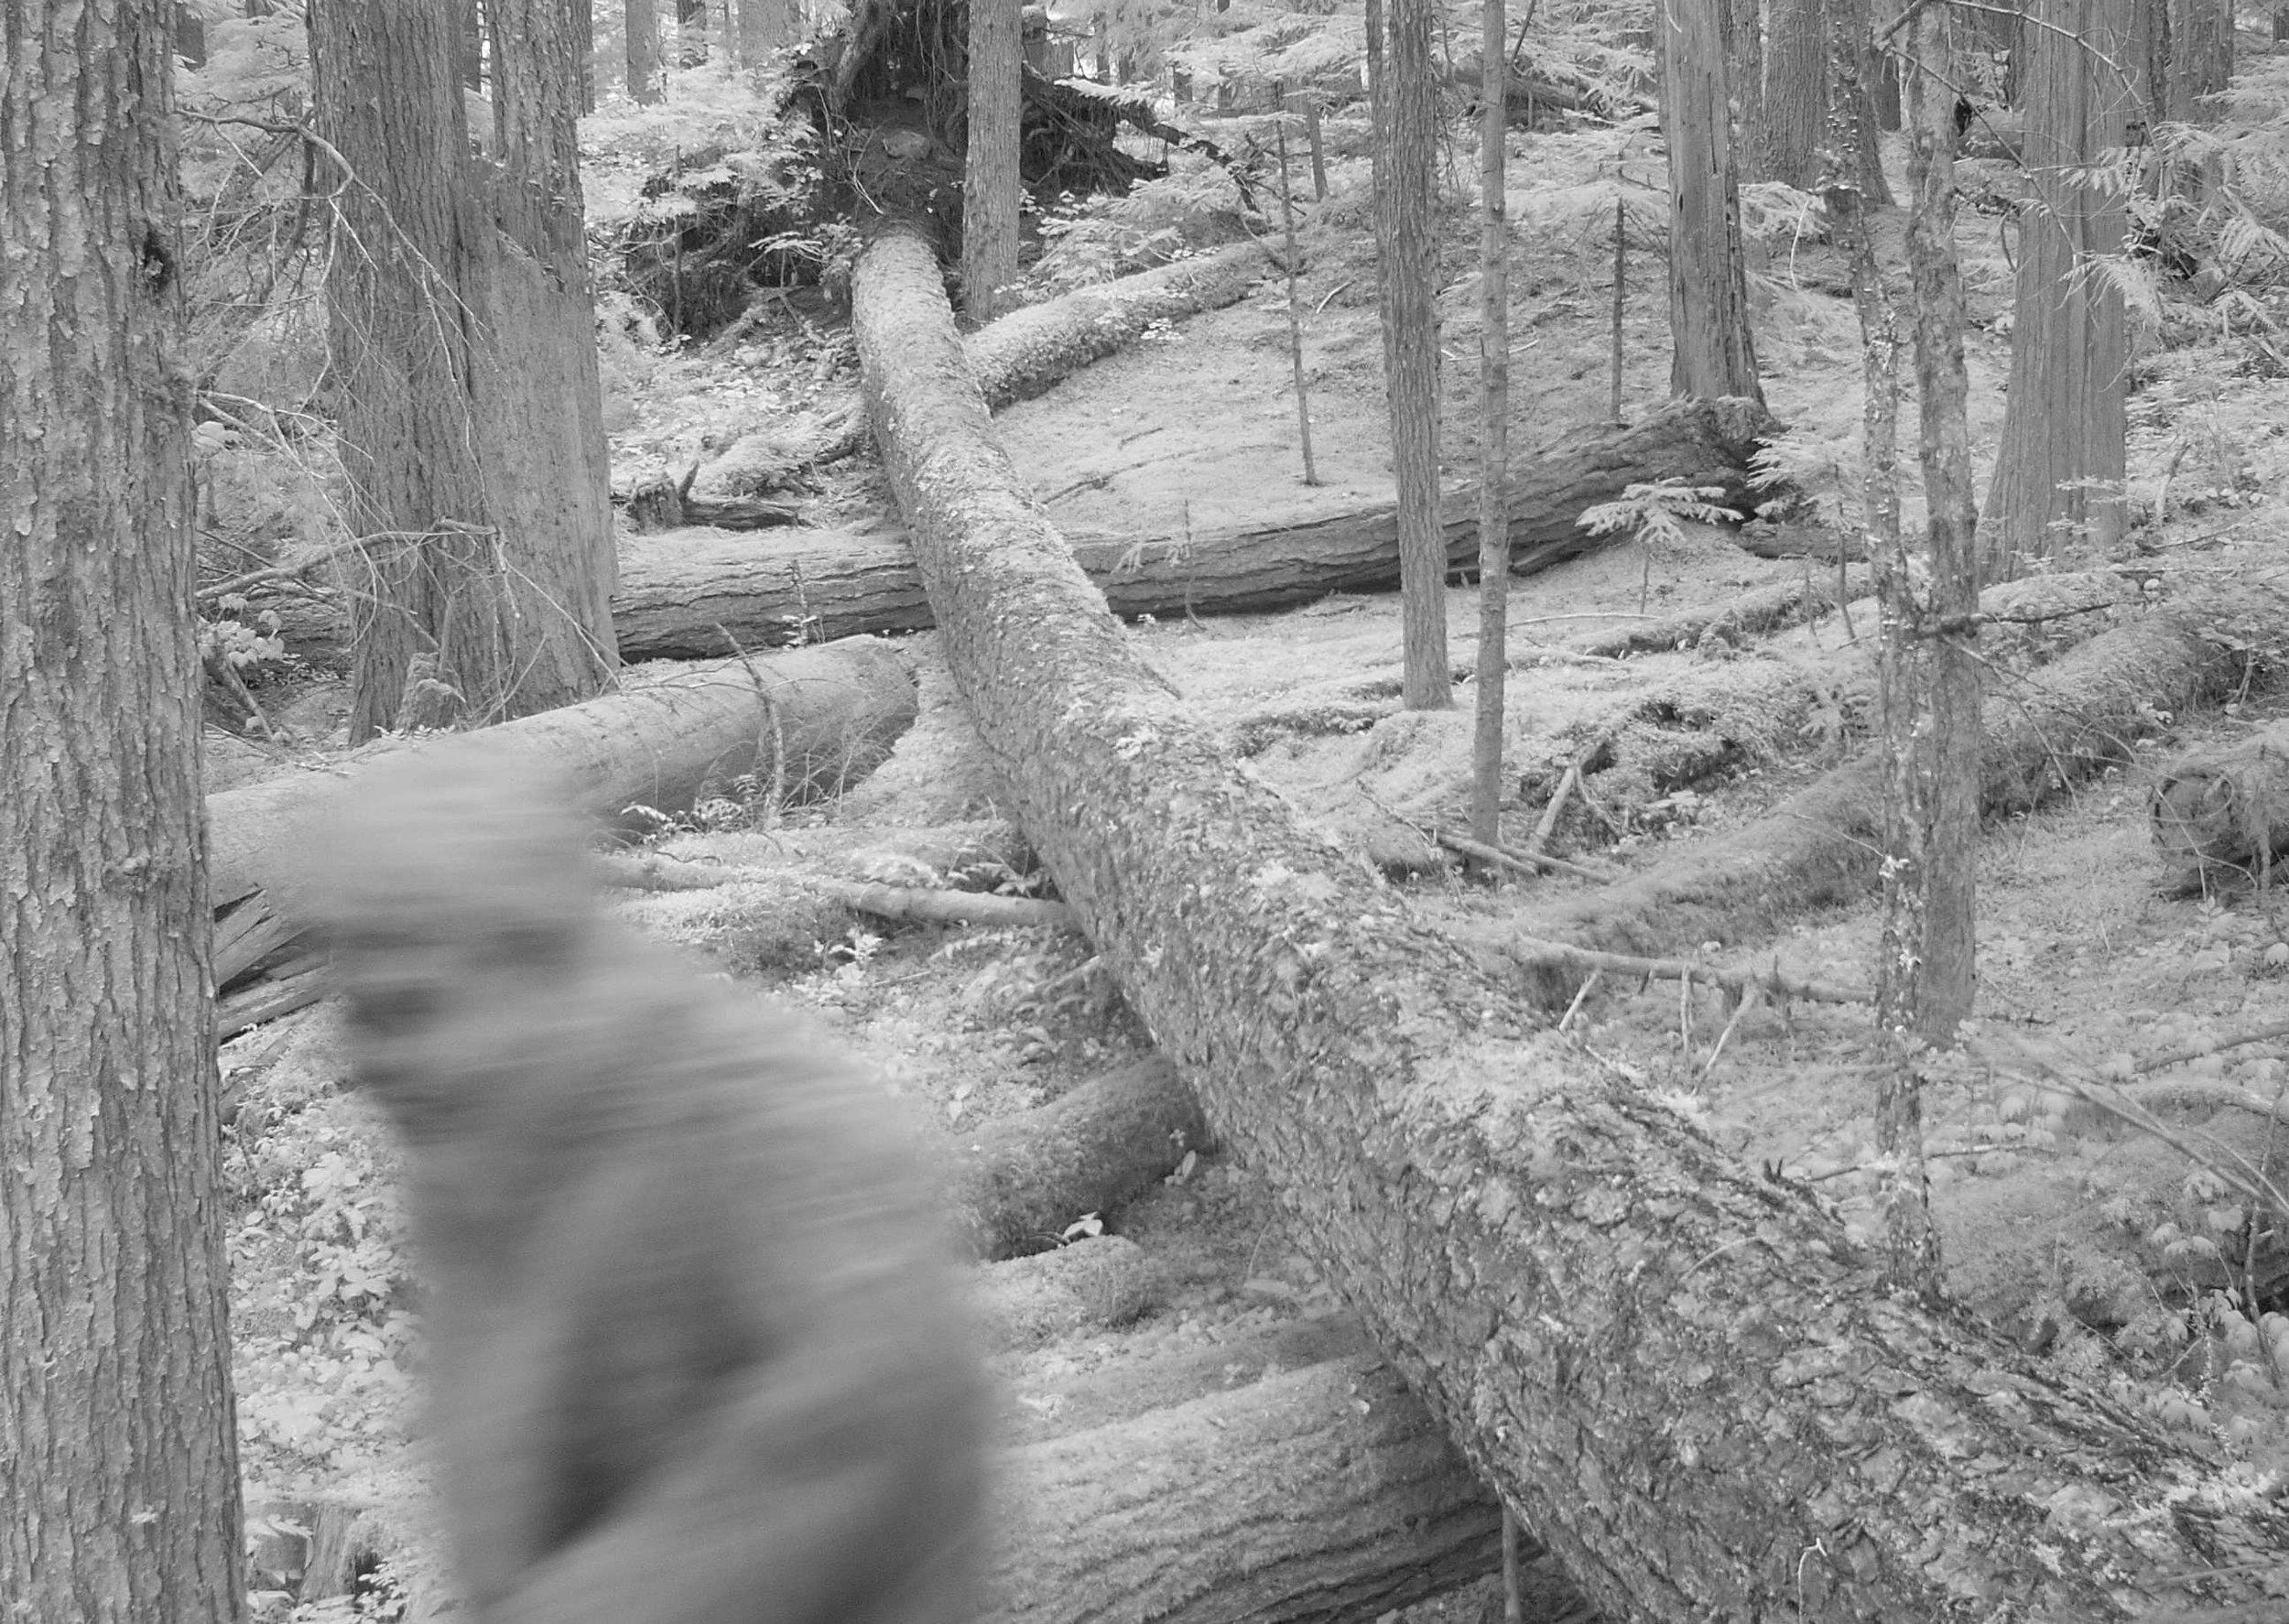 Sasquatch Sighting, Downed Log